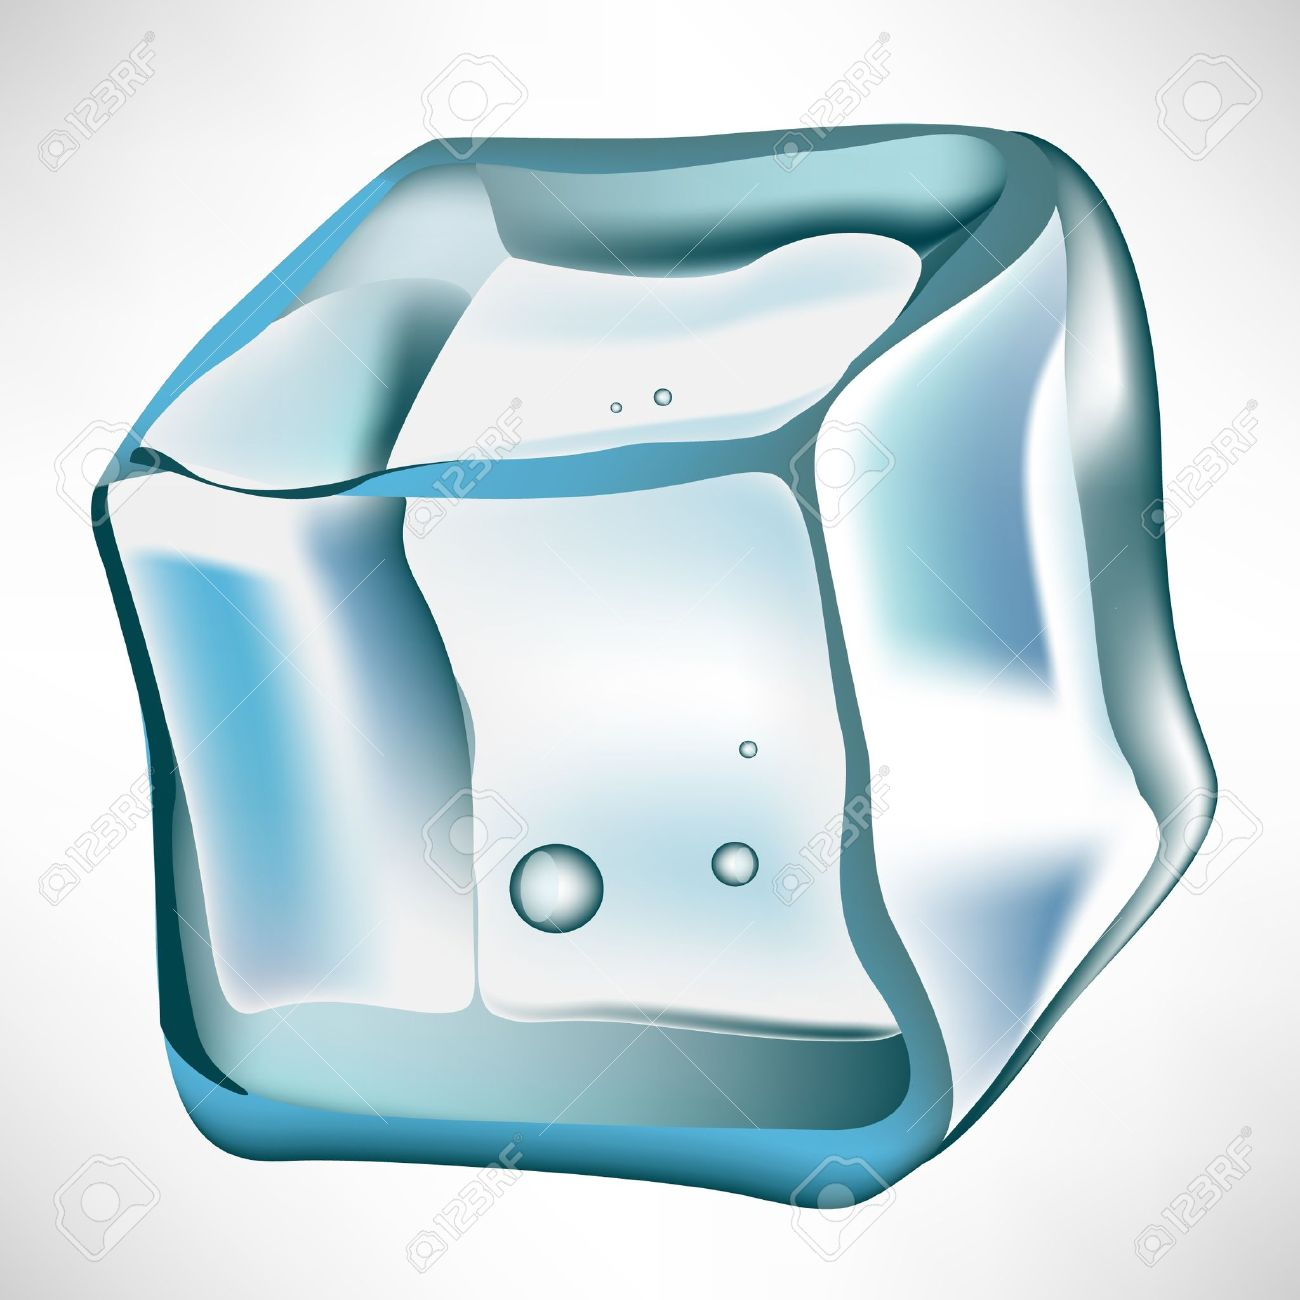 Ice Cube Clipart #1. ice clipart-Ice Cube Clipart #1. ice clipart-8